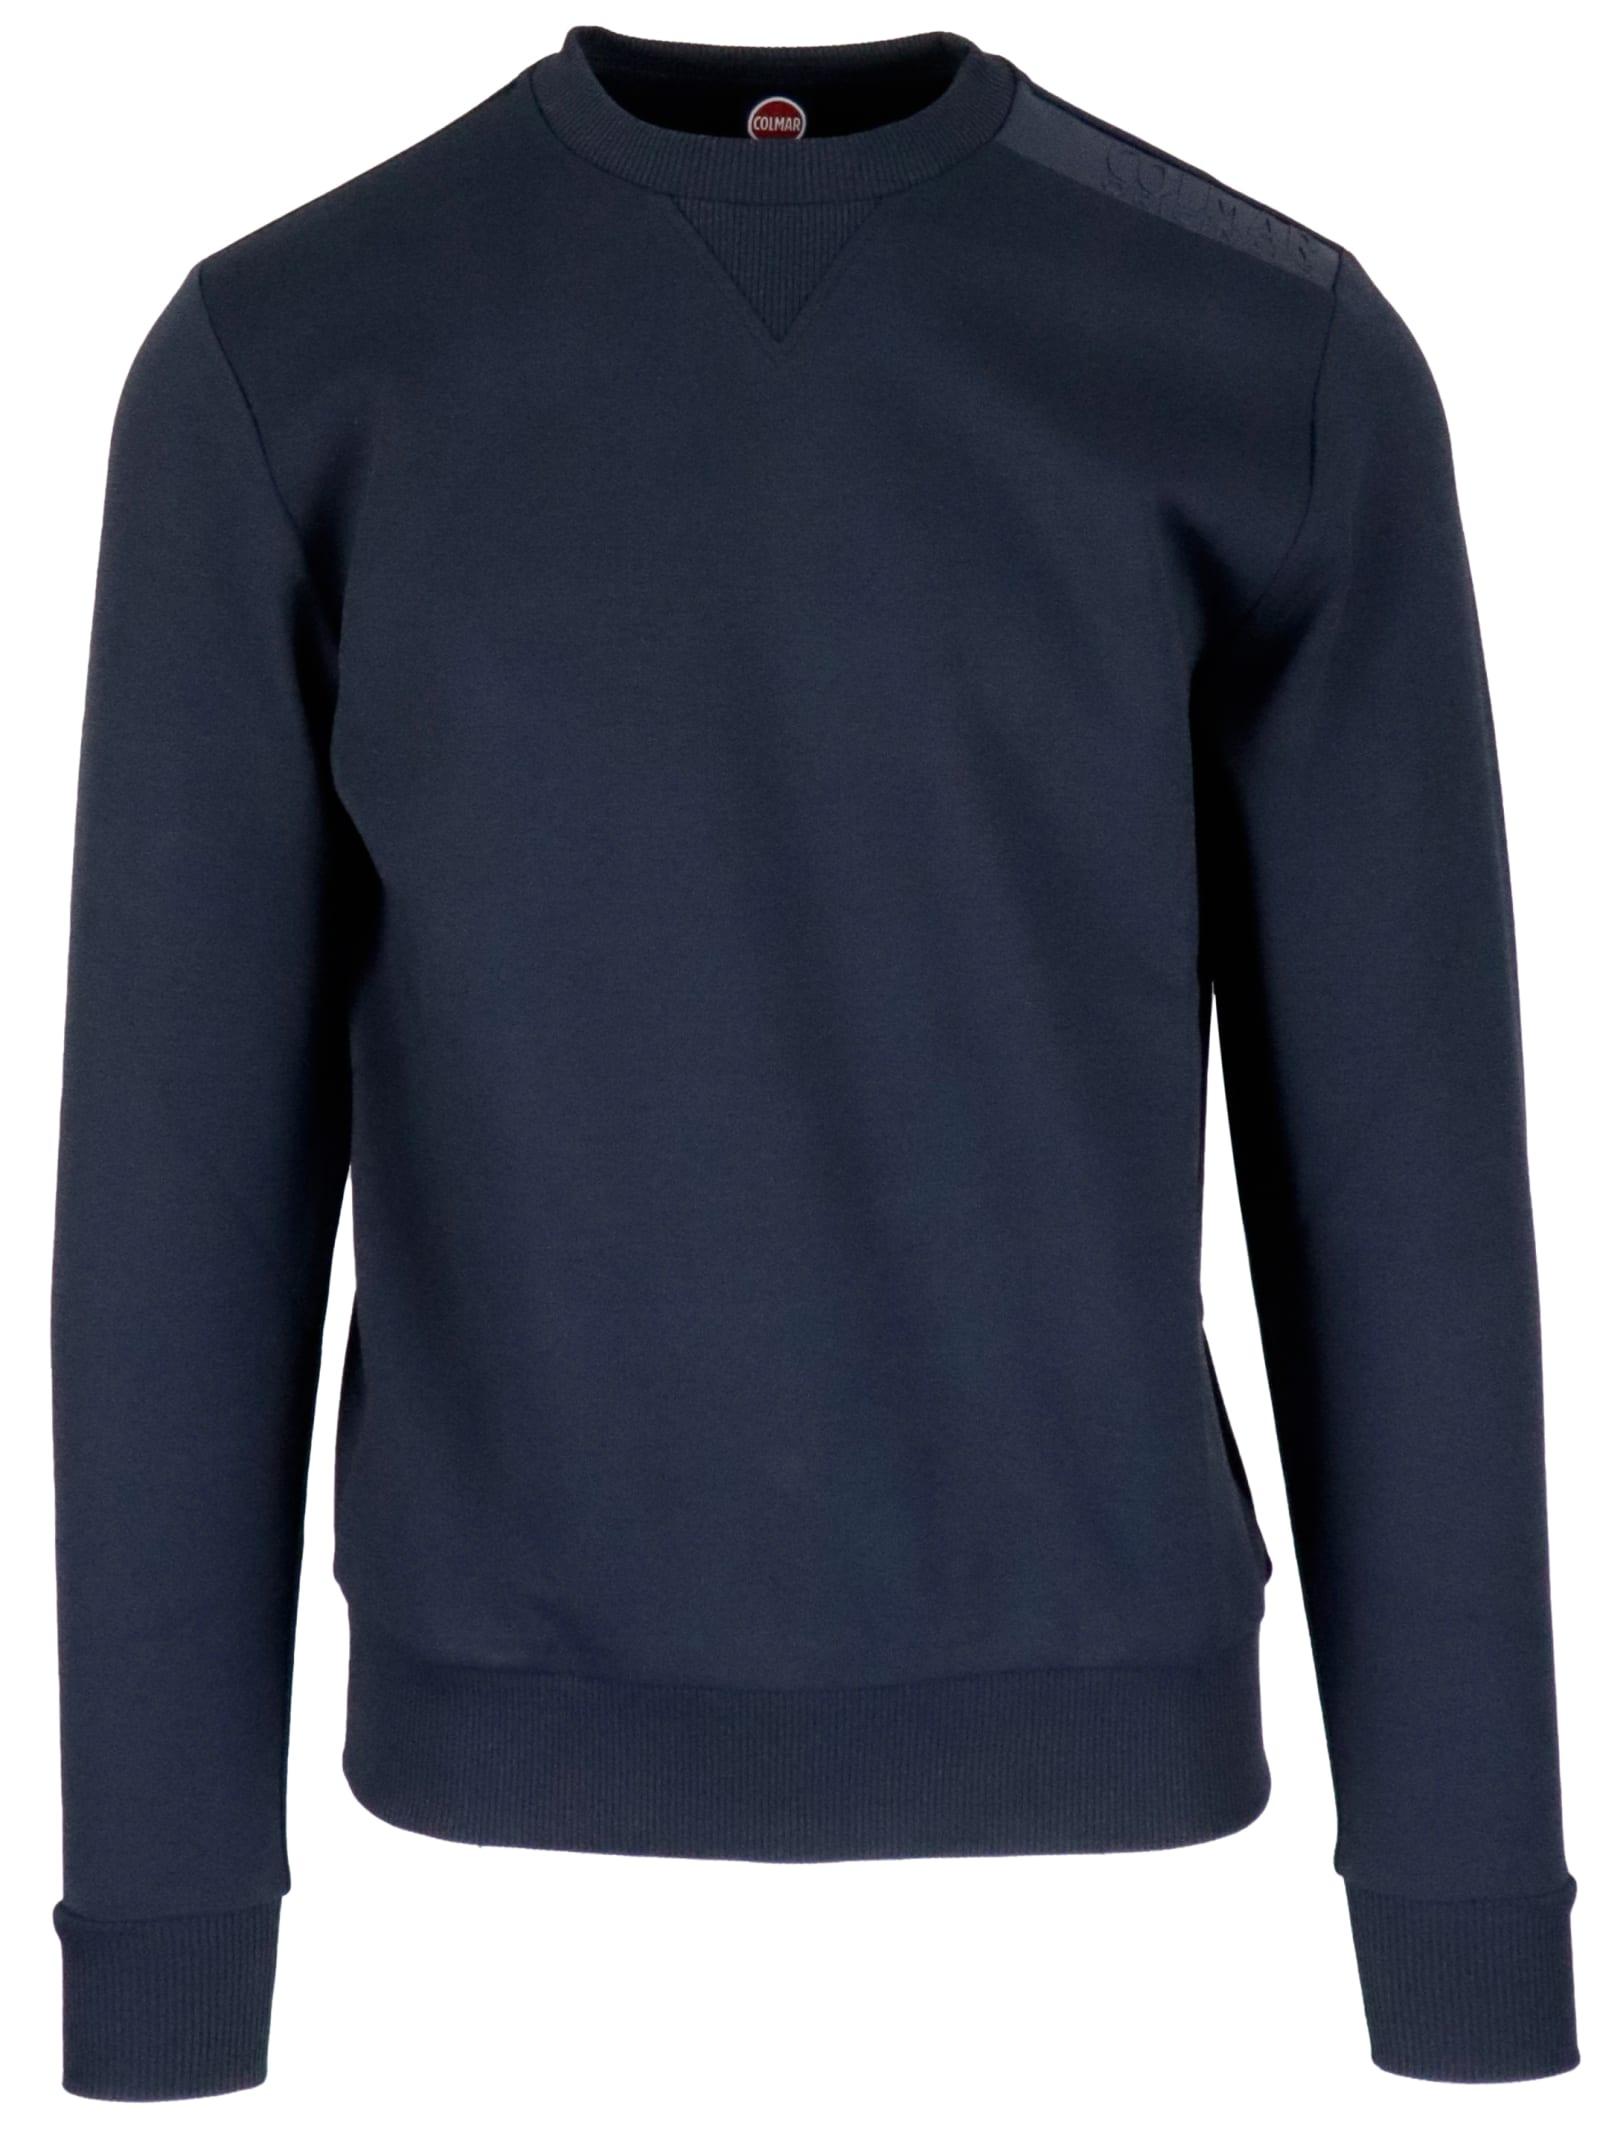 Colmar Sweatshirts SWEATERSHIRT UOMO SWEATSHIRT